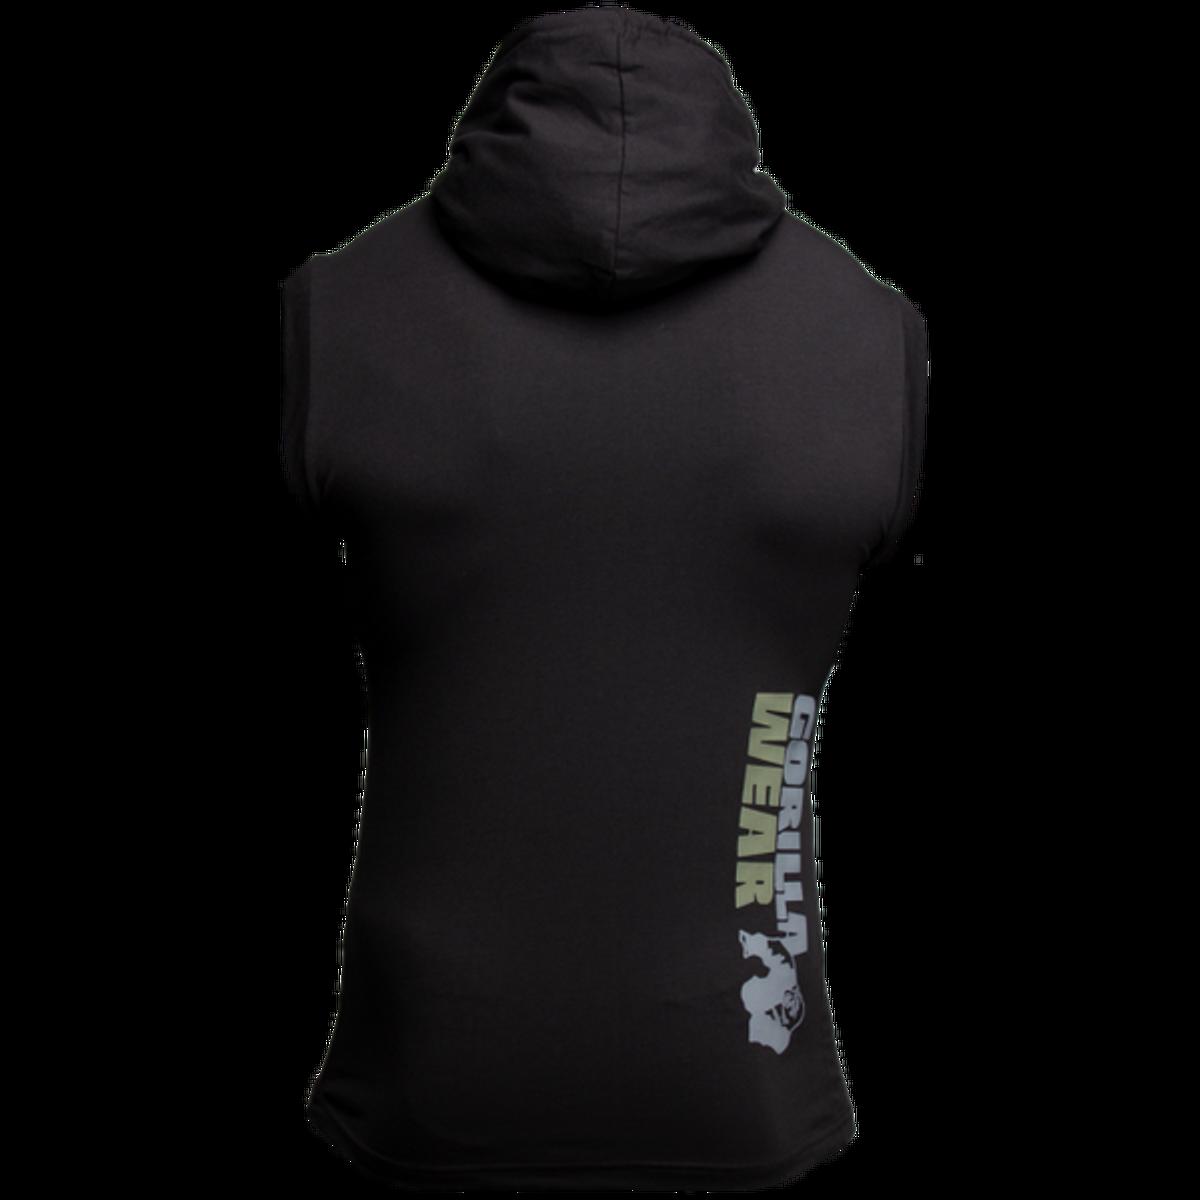 Melbourne S/L Hooded T-Shirt